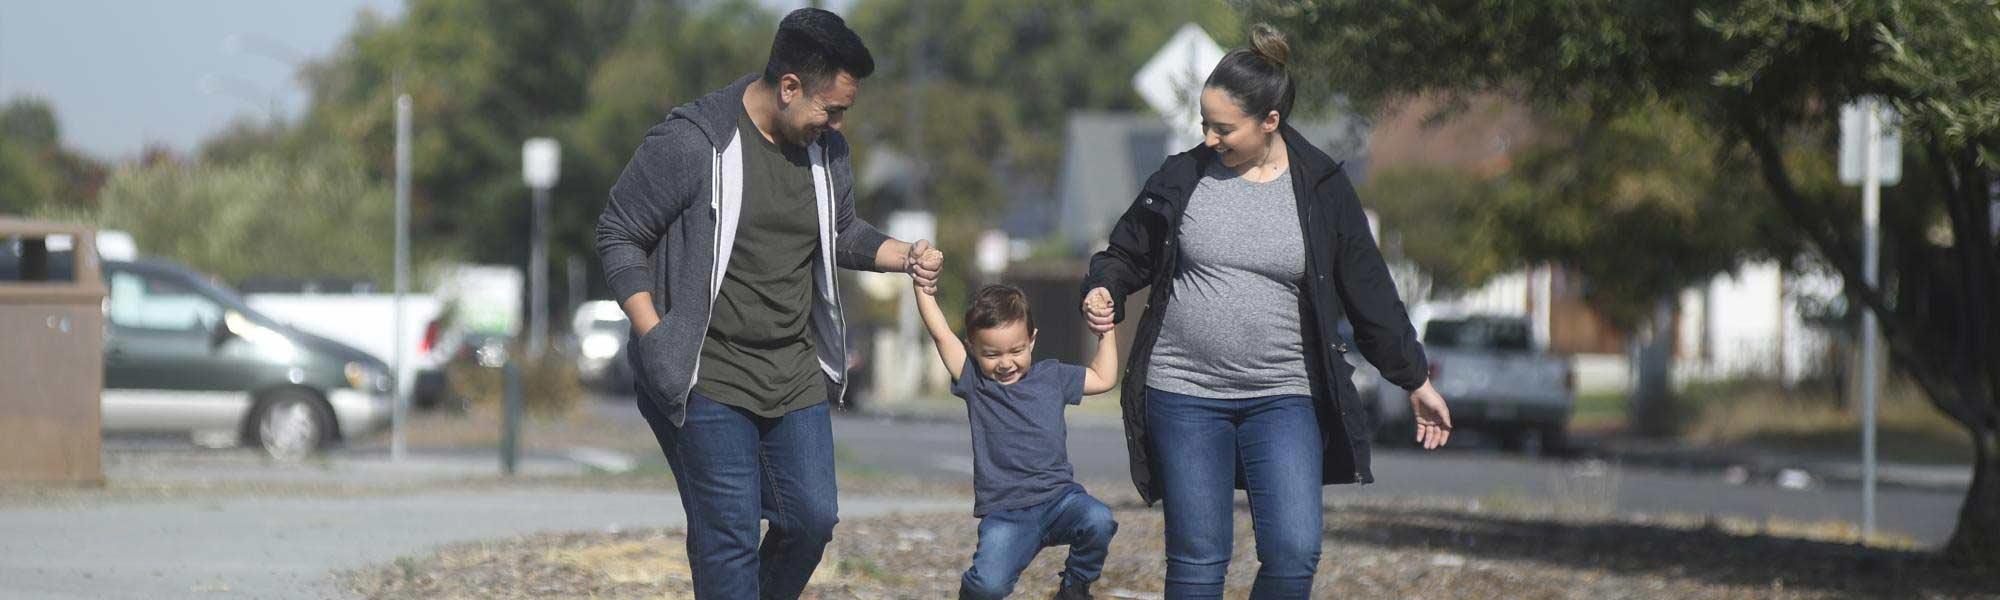 Couple & Their Child